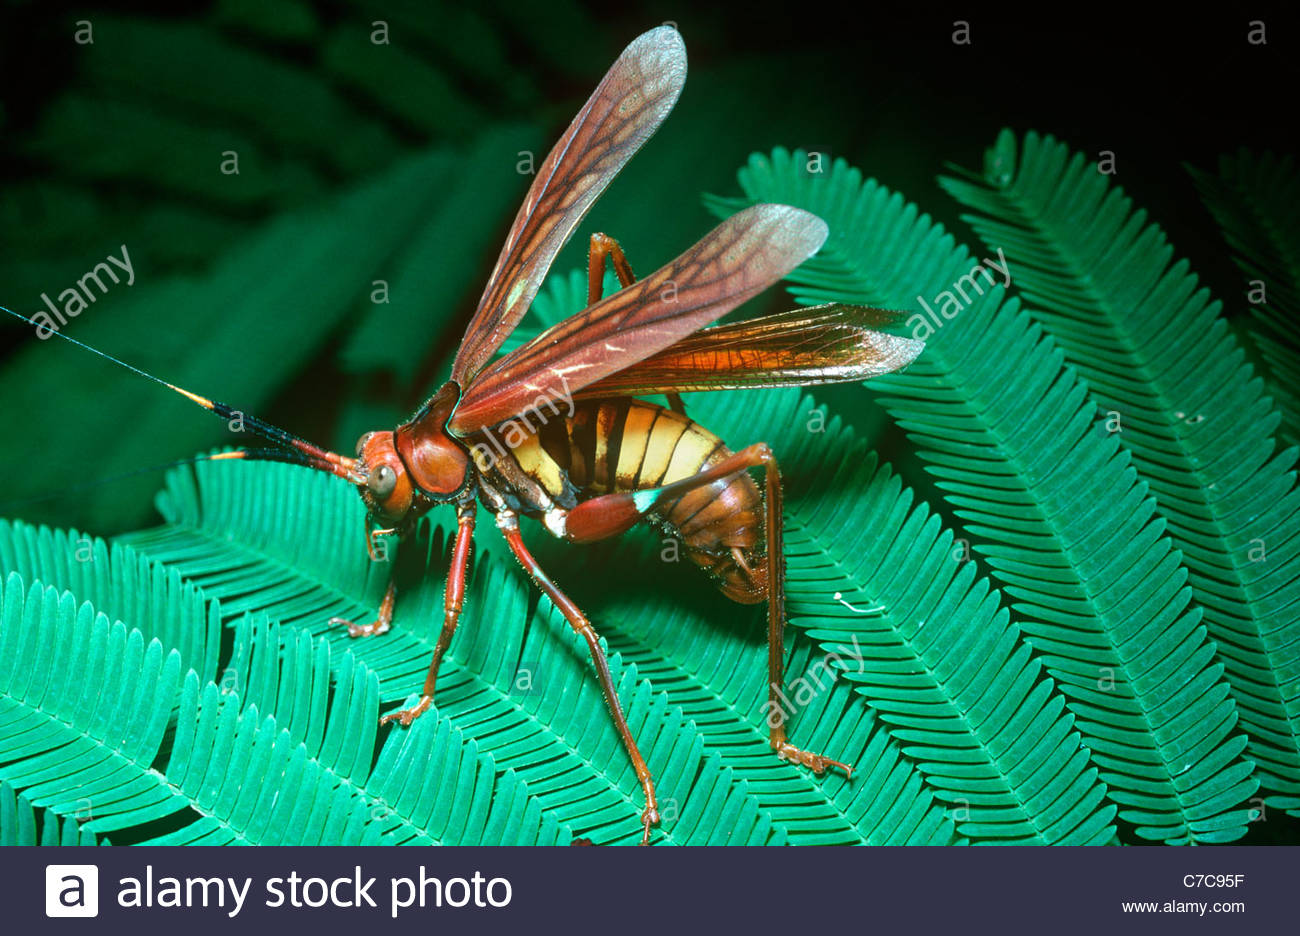 Bush-cricket / katydid (Scaphura sp.) which when alarmed raises its wings